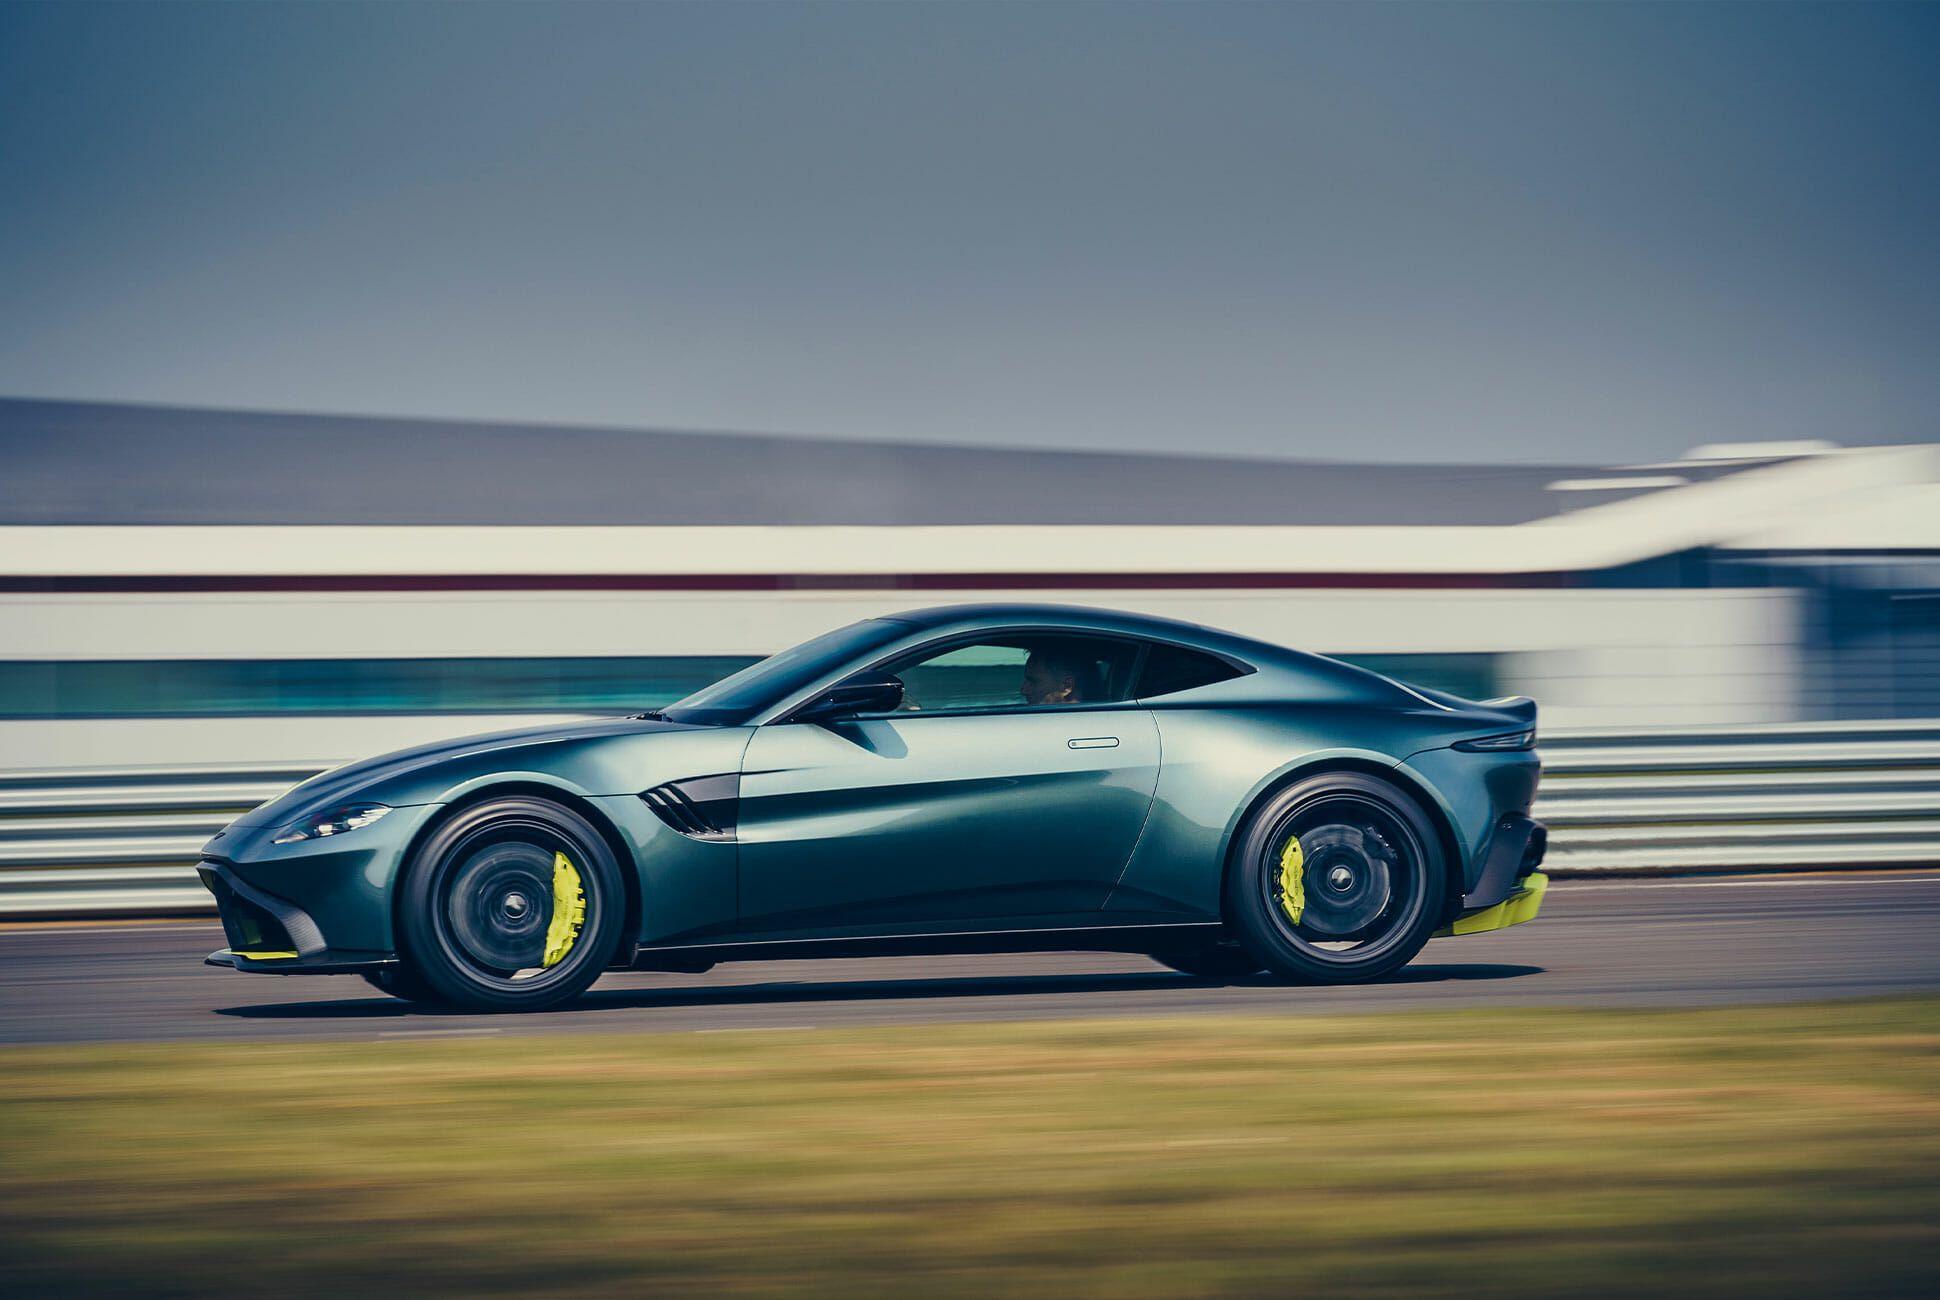 Aston-Martin-Vantage-AMR-Gear-Patrol-slide-2